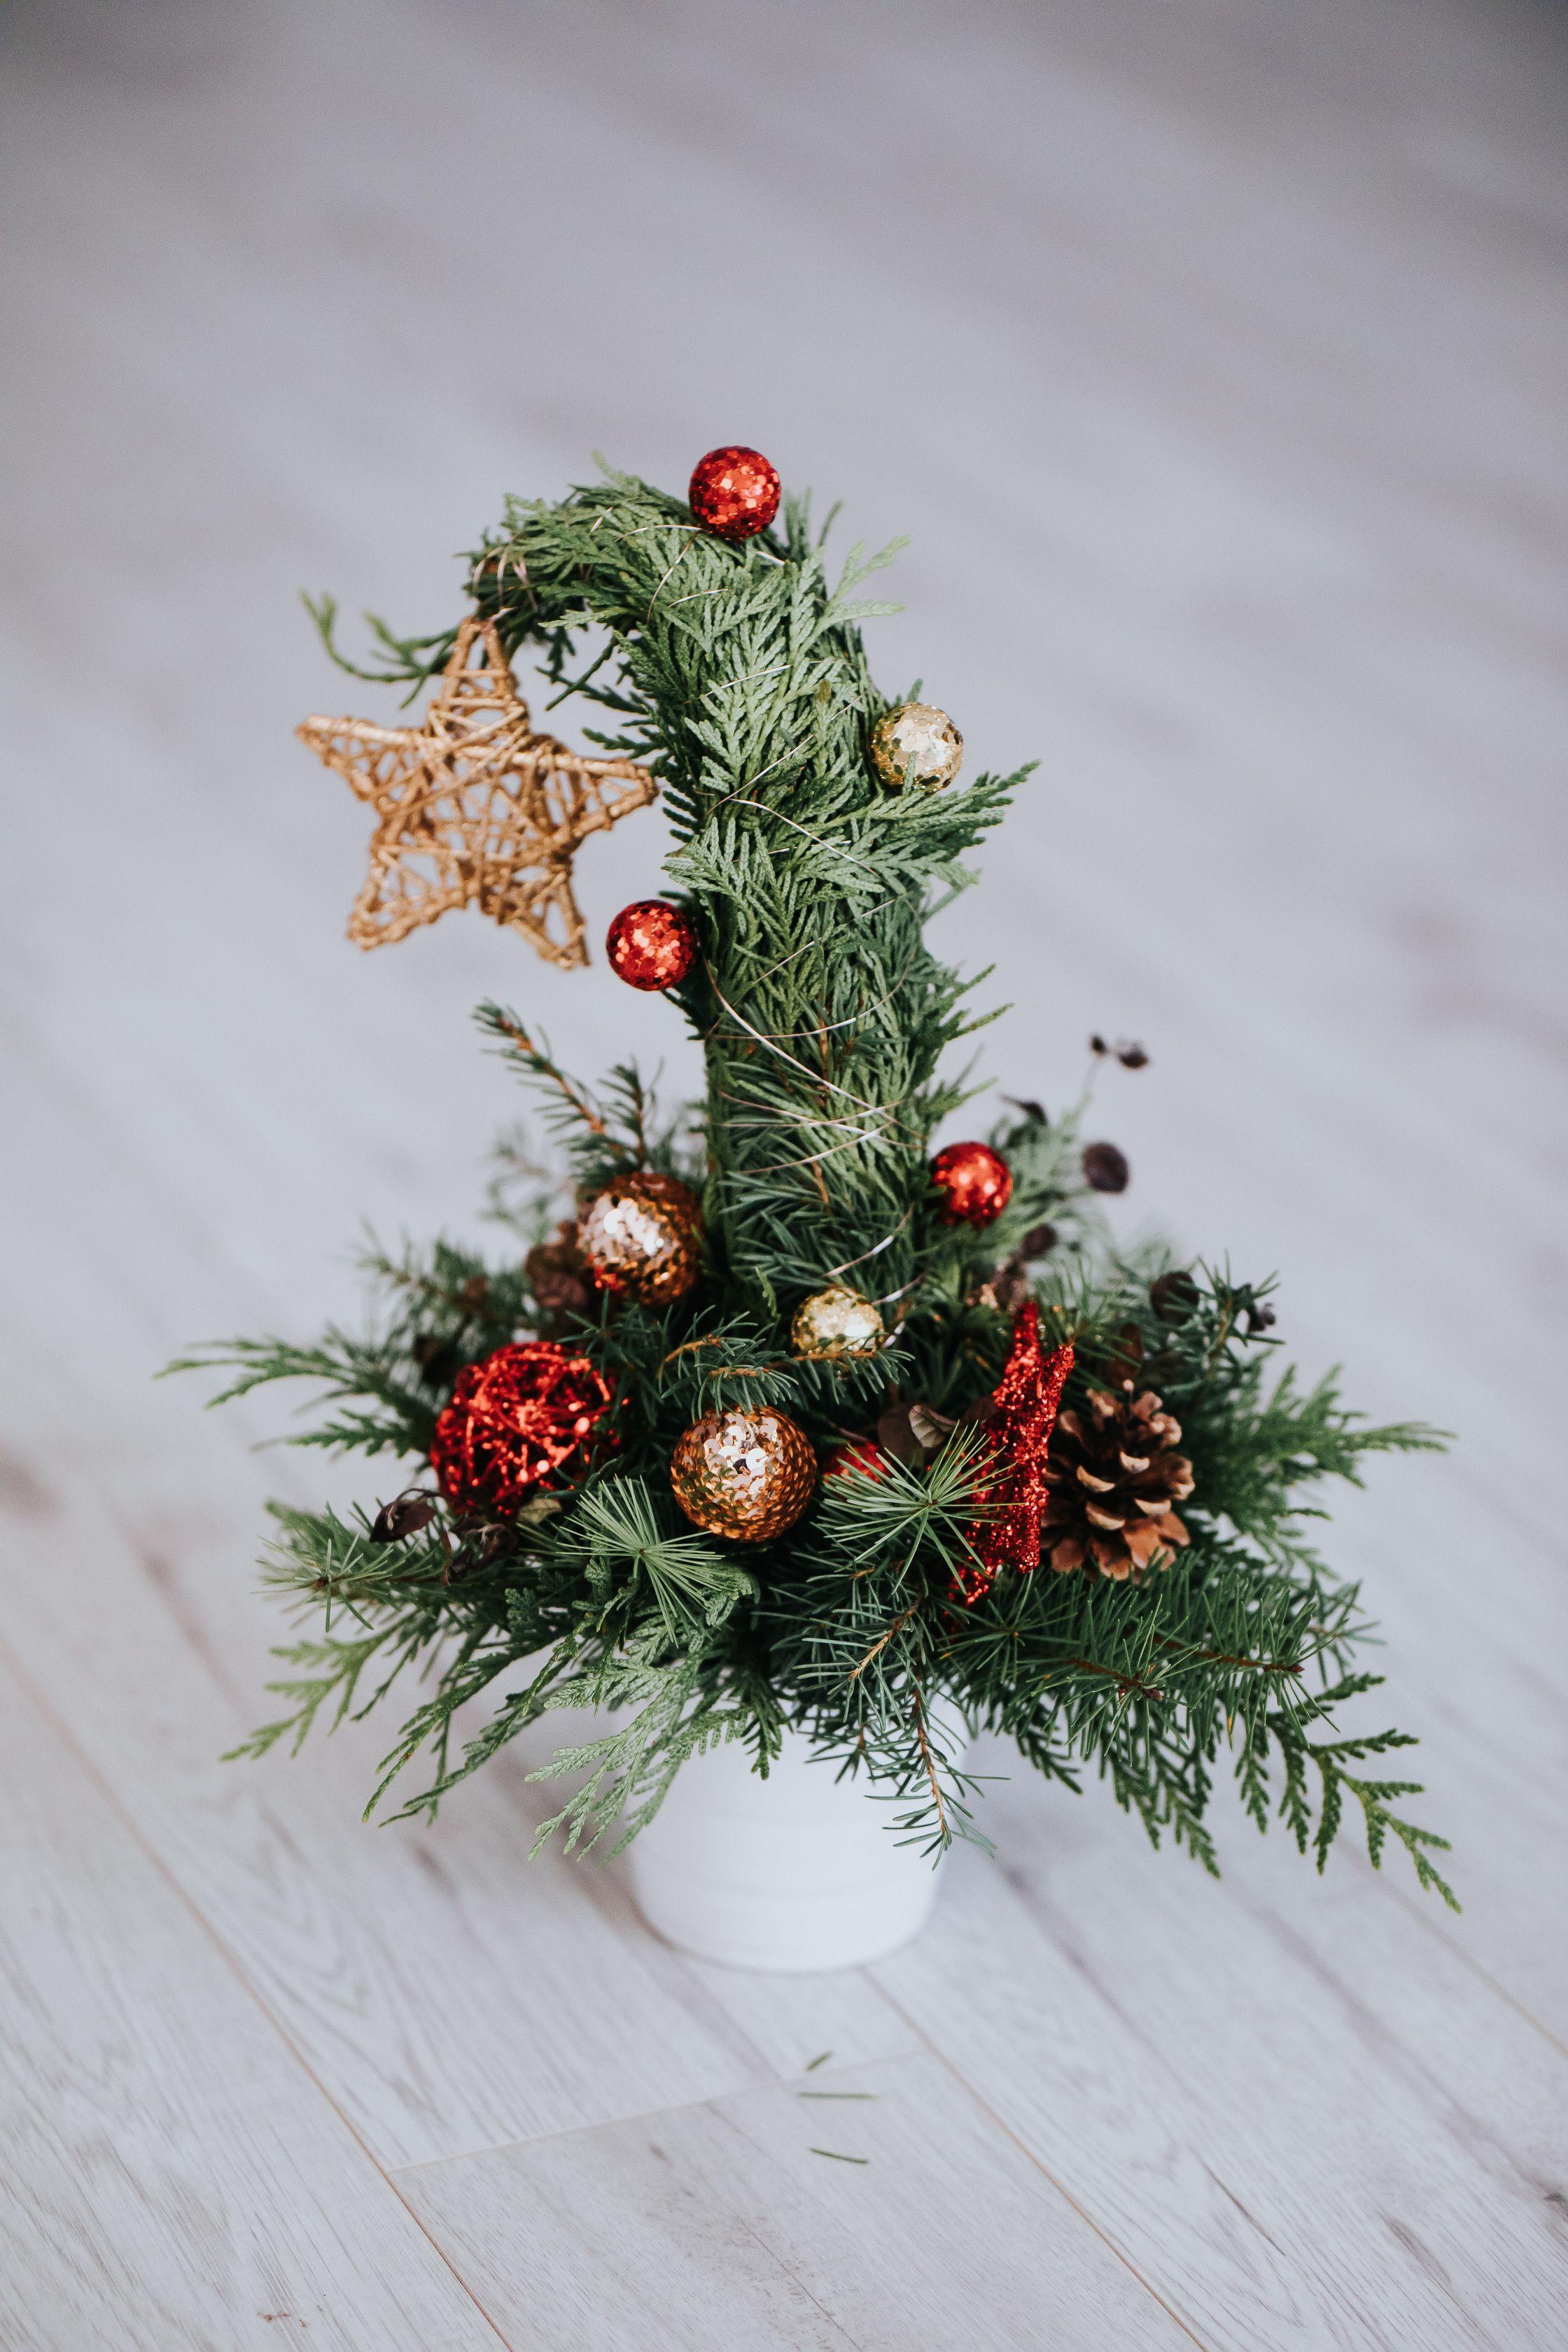 Fresh cedar grinch tree centerpieces for a festive holiday